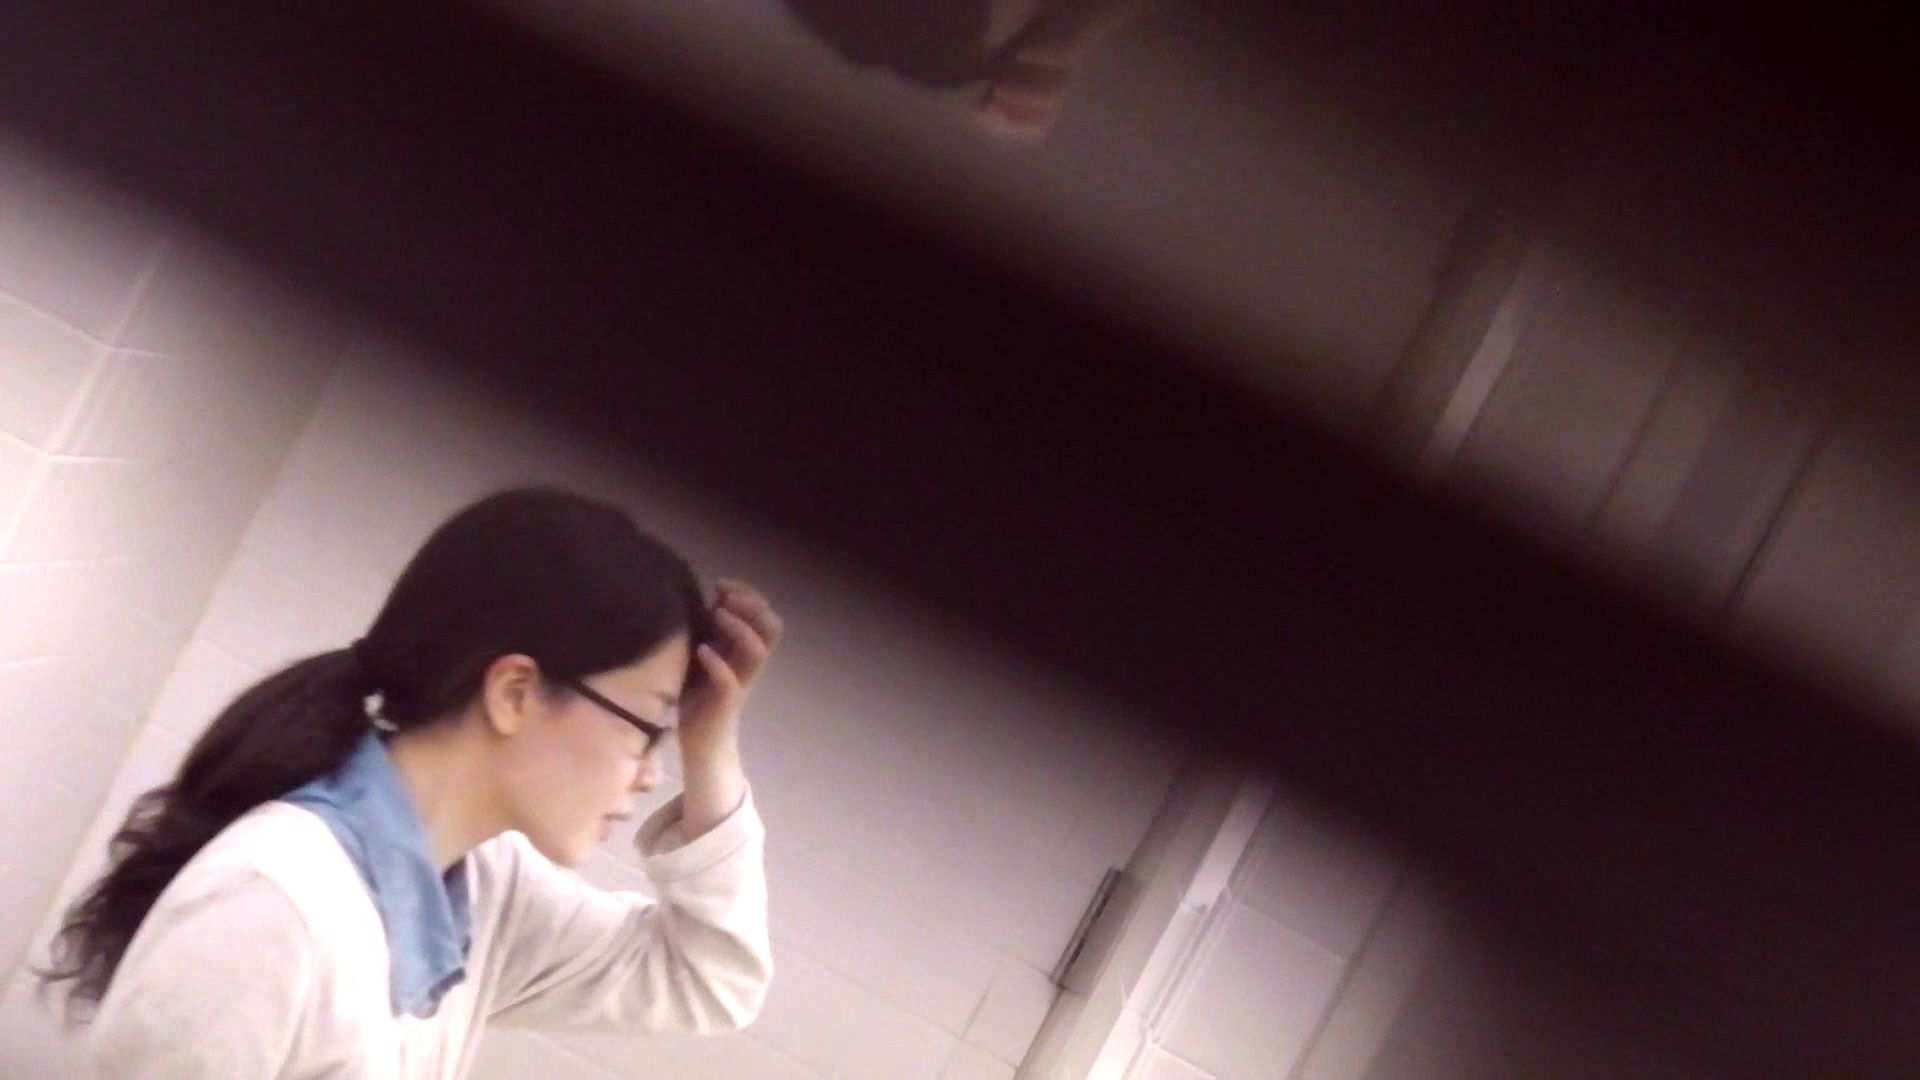 vol.17 命がけ潜伏洗面所! 張り裂けんばかりの大物 潜入 盗み撮り動画 69連発 34